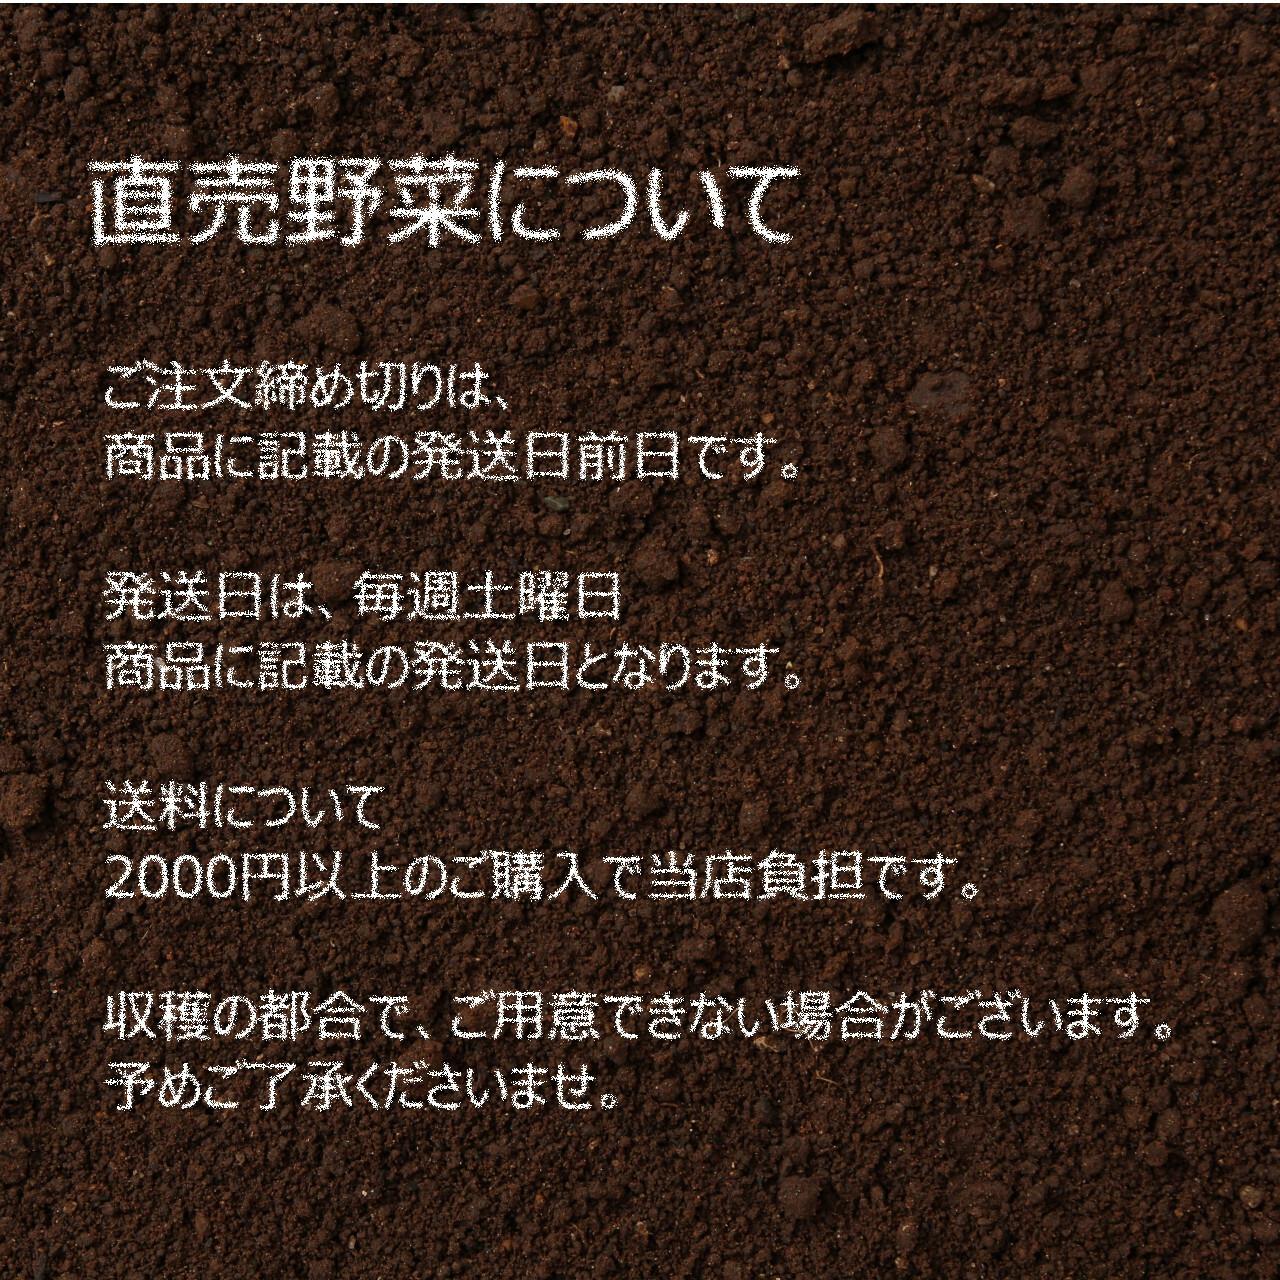 大根菜 約300g: 6月の朝採り直売野菜 6月1日発送予定